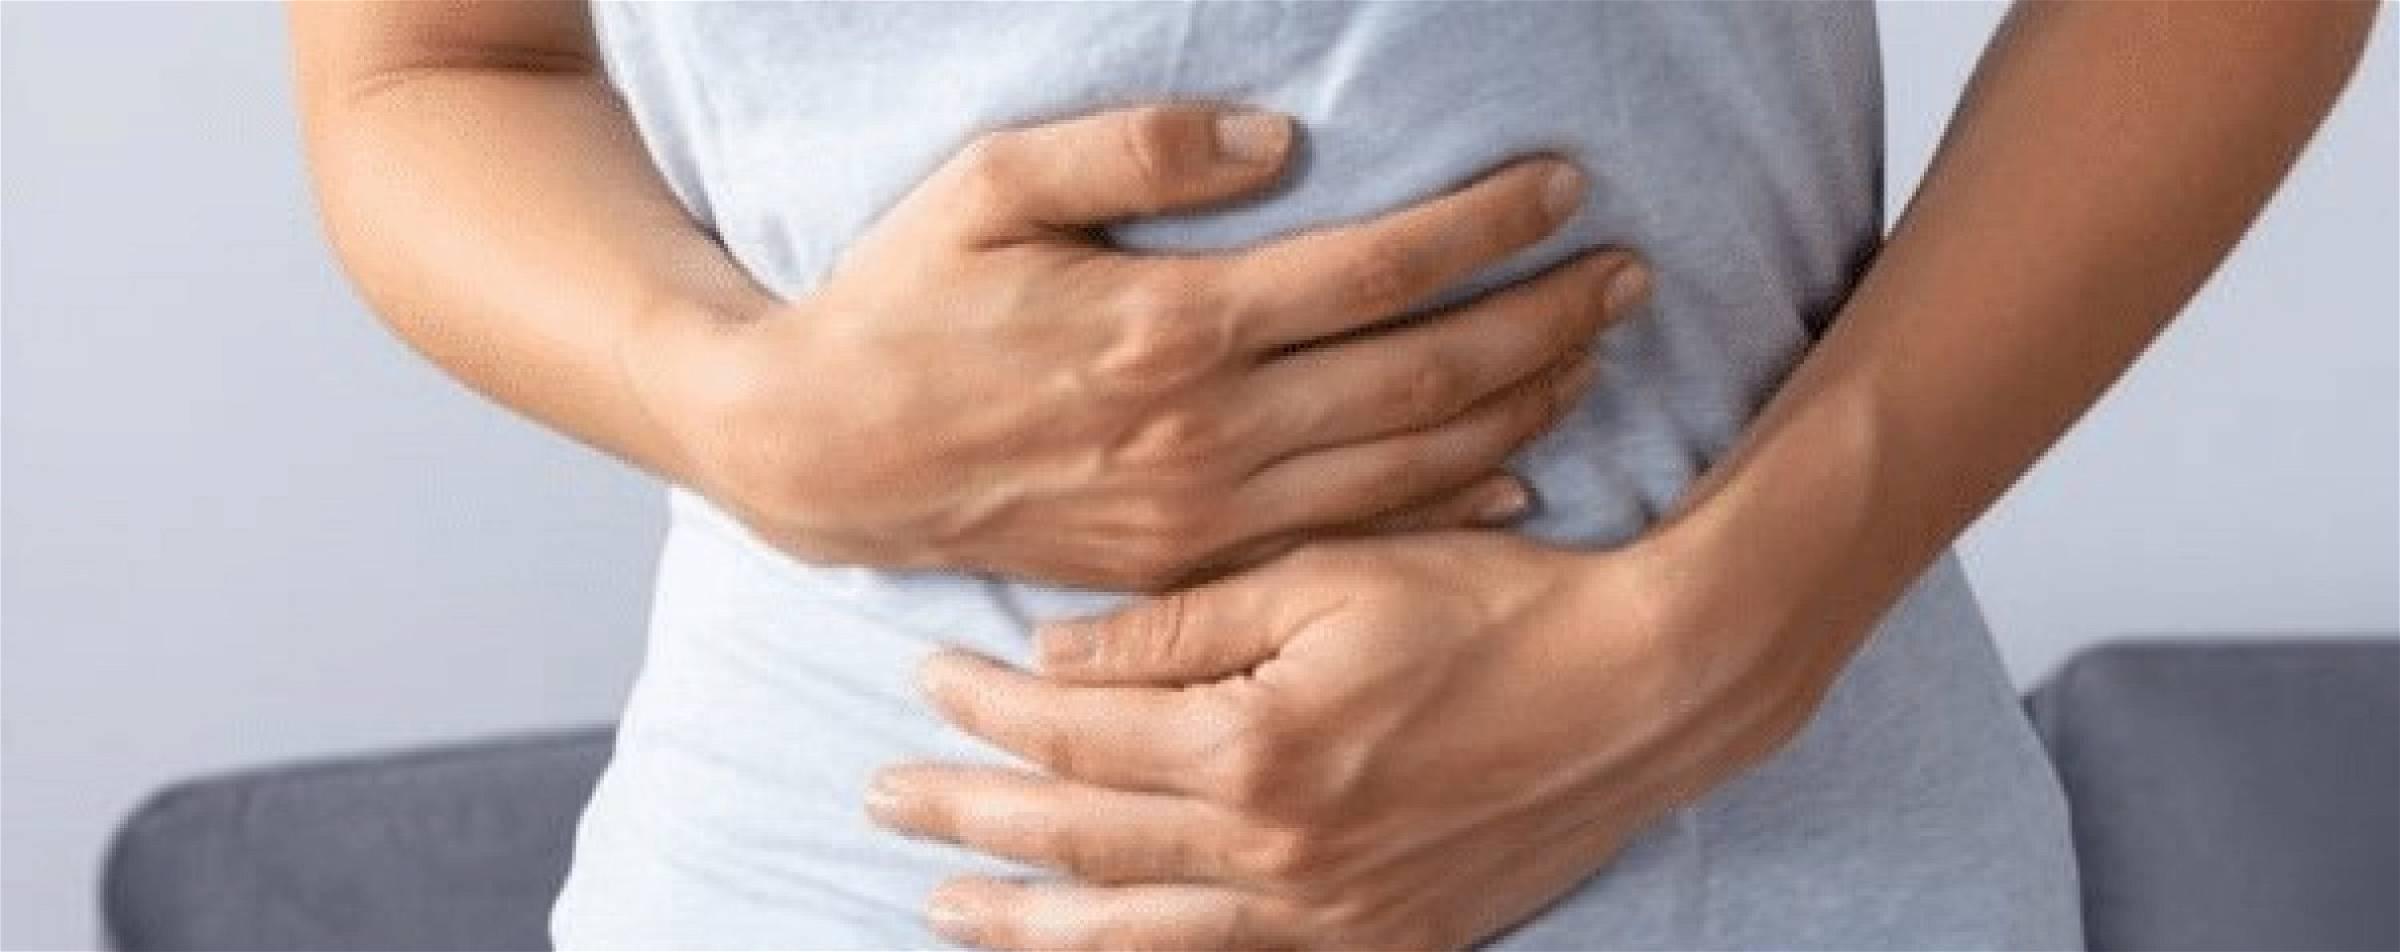 glutenallergie symptomen